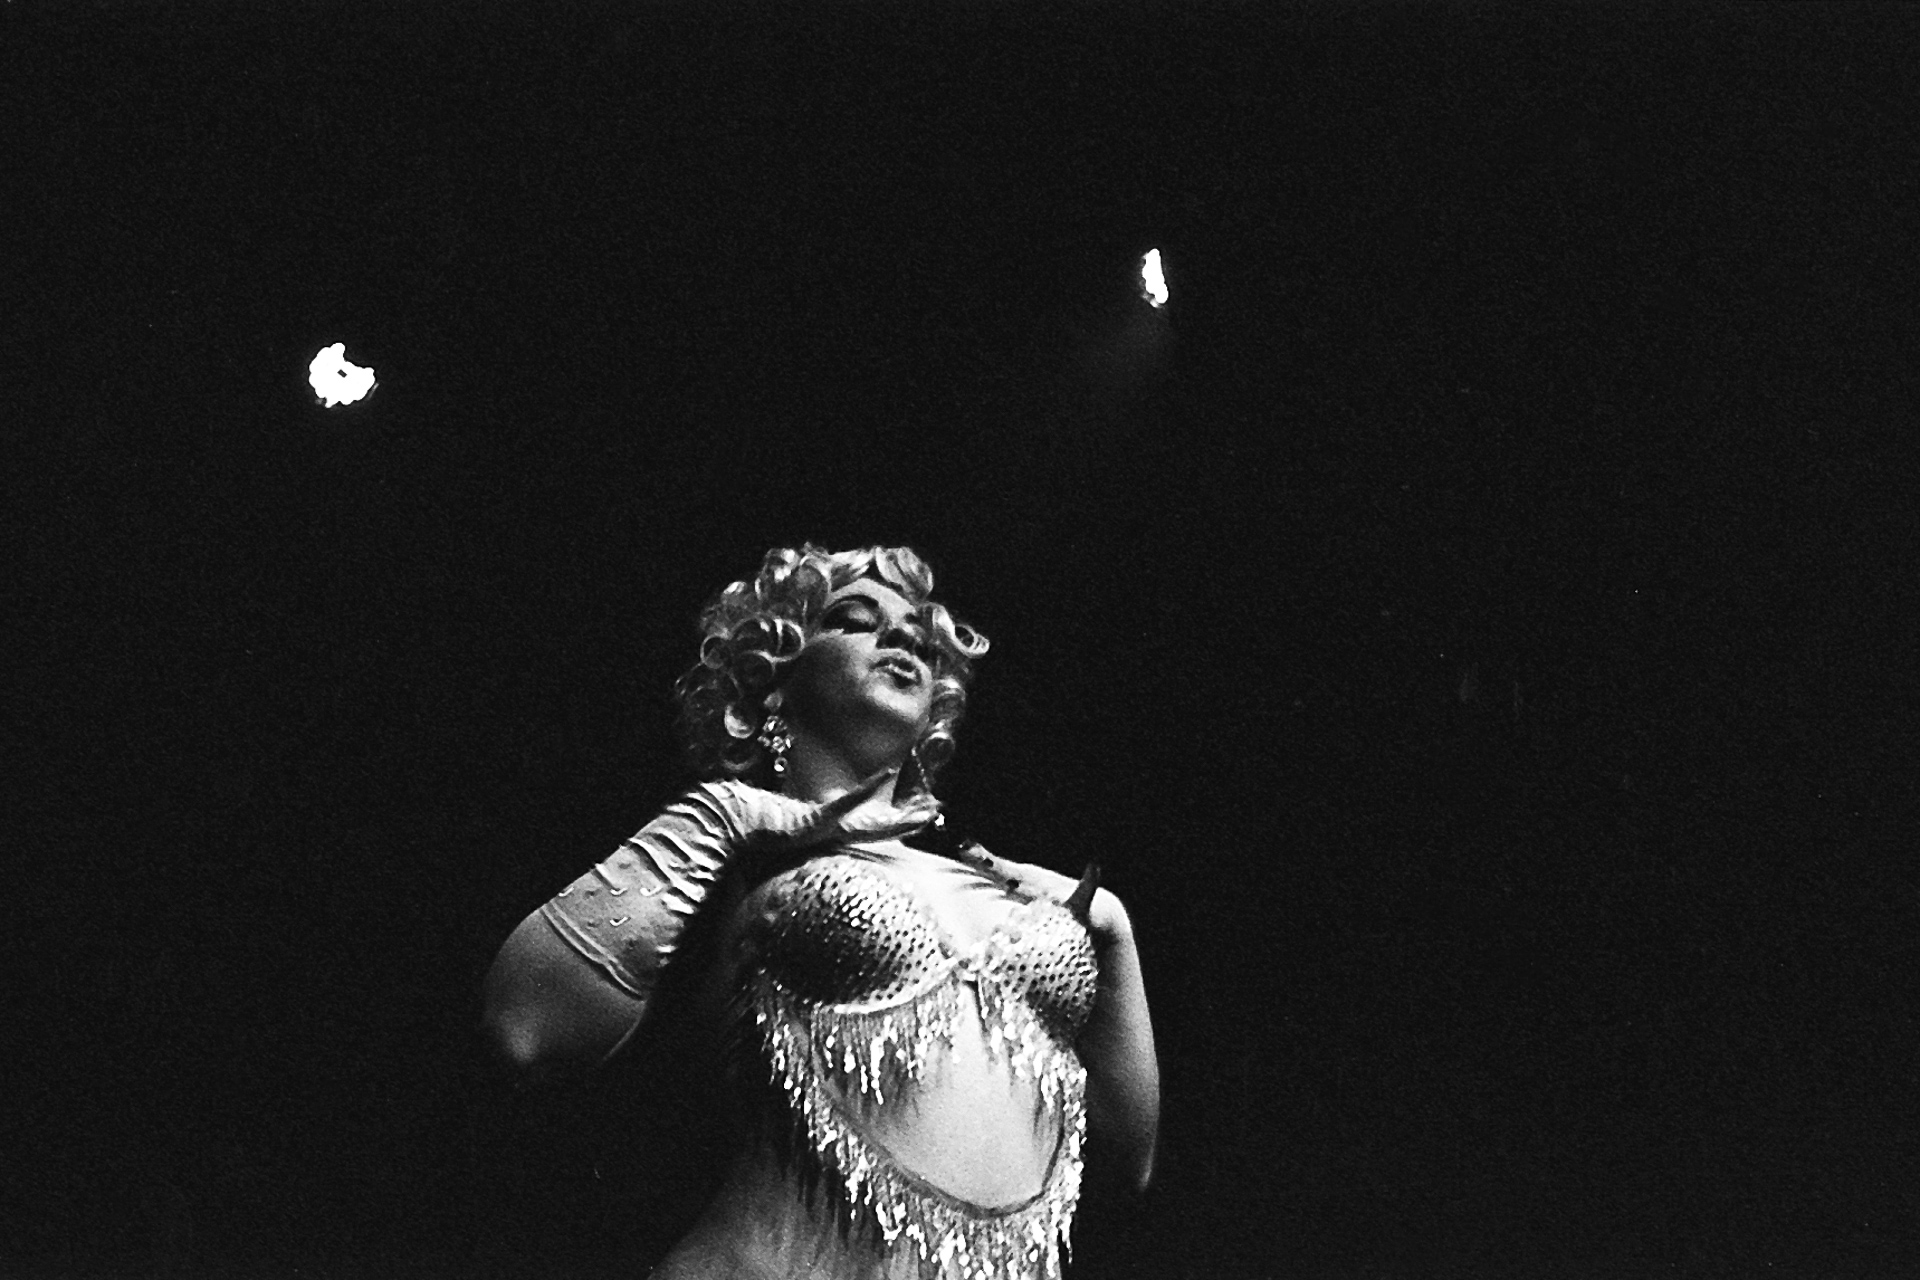 Burlesque performer | Manhattan, 2015